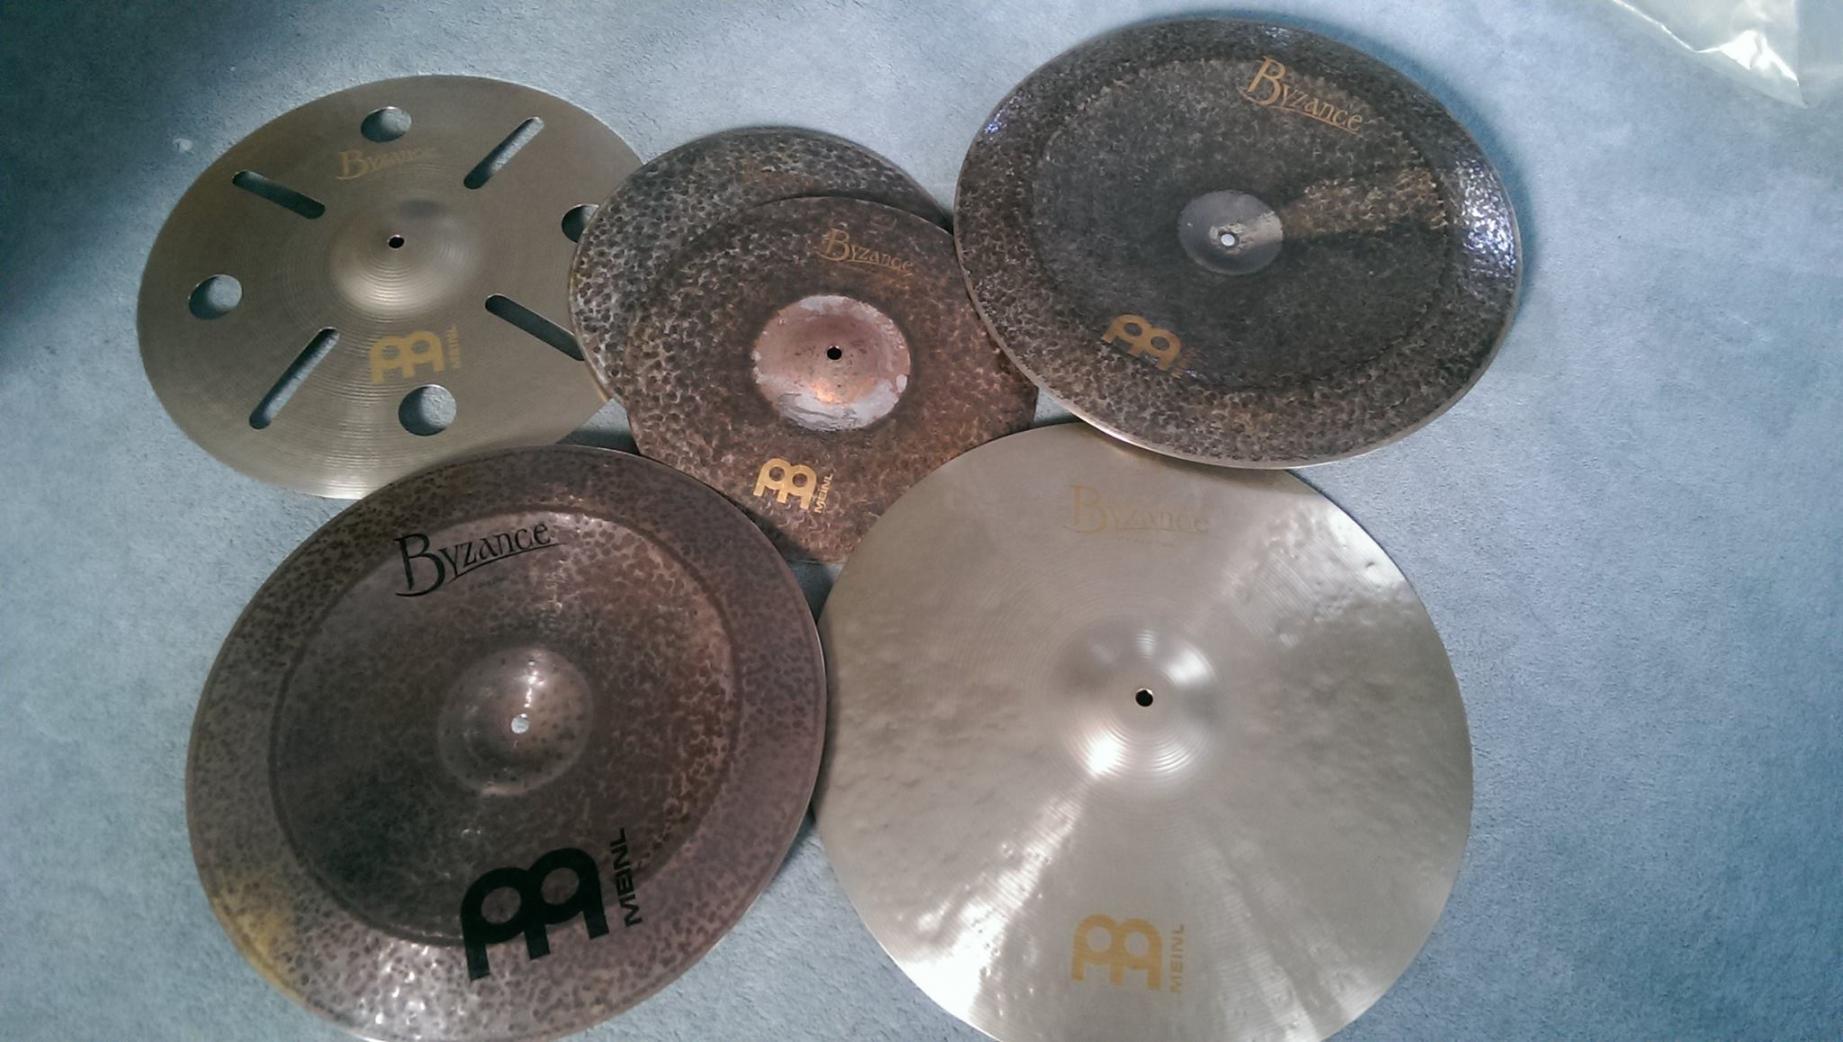 Unpacking Cymbals